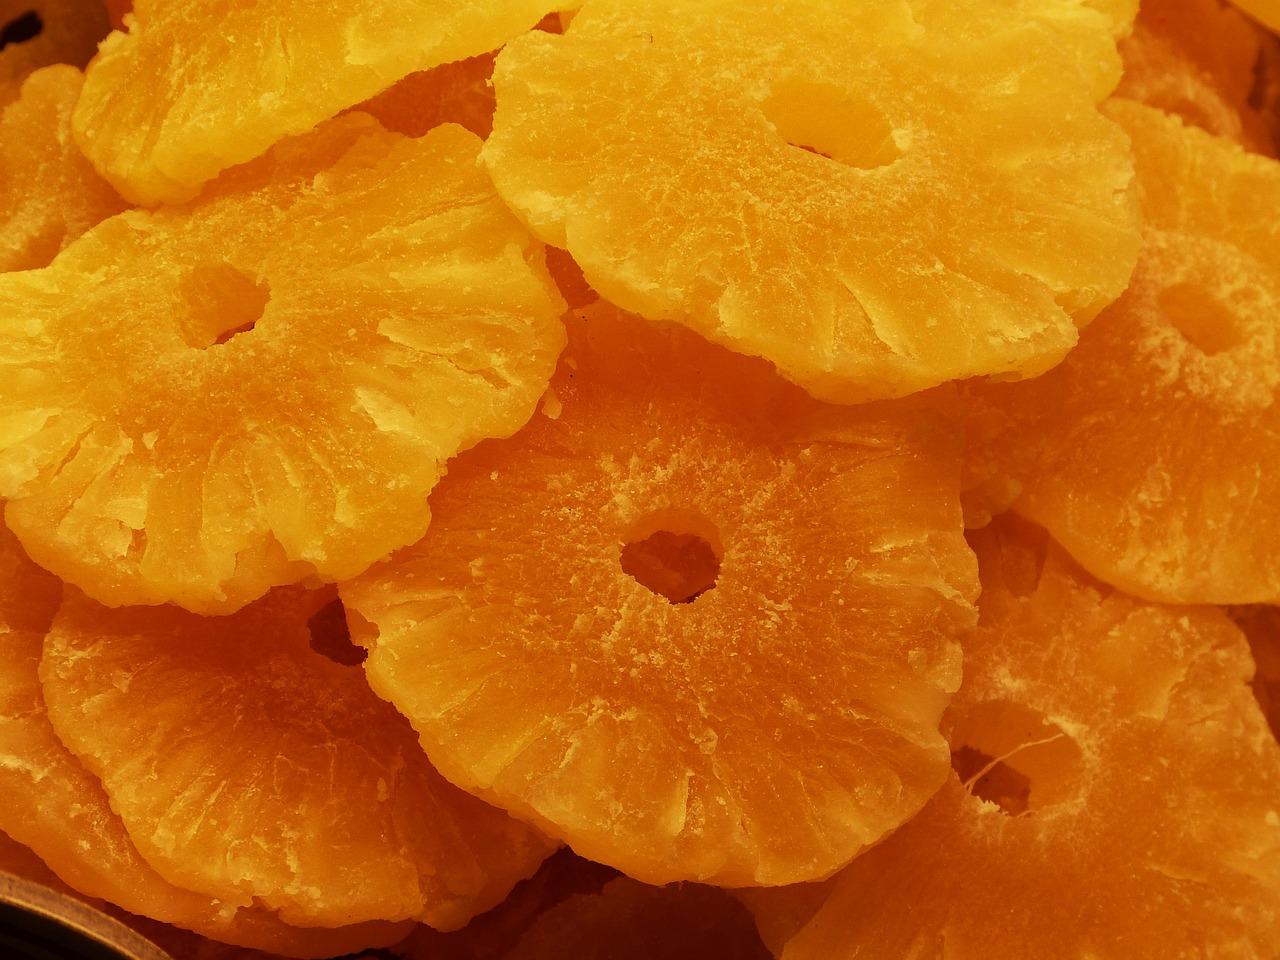 dried-fruit-782317_1280